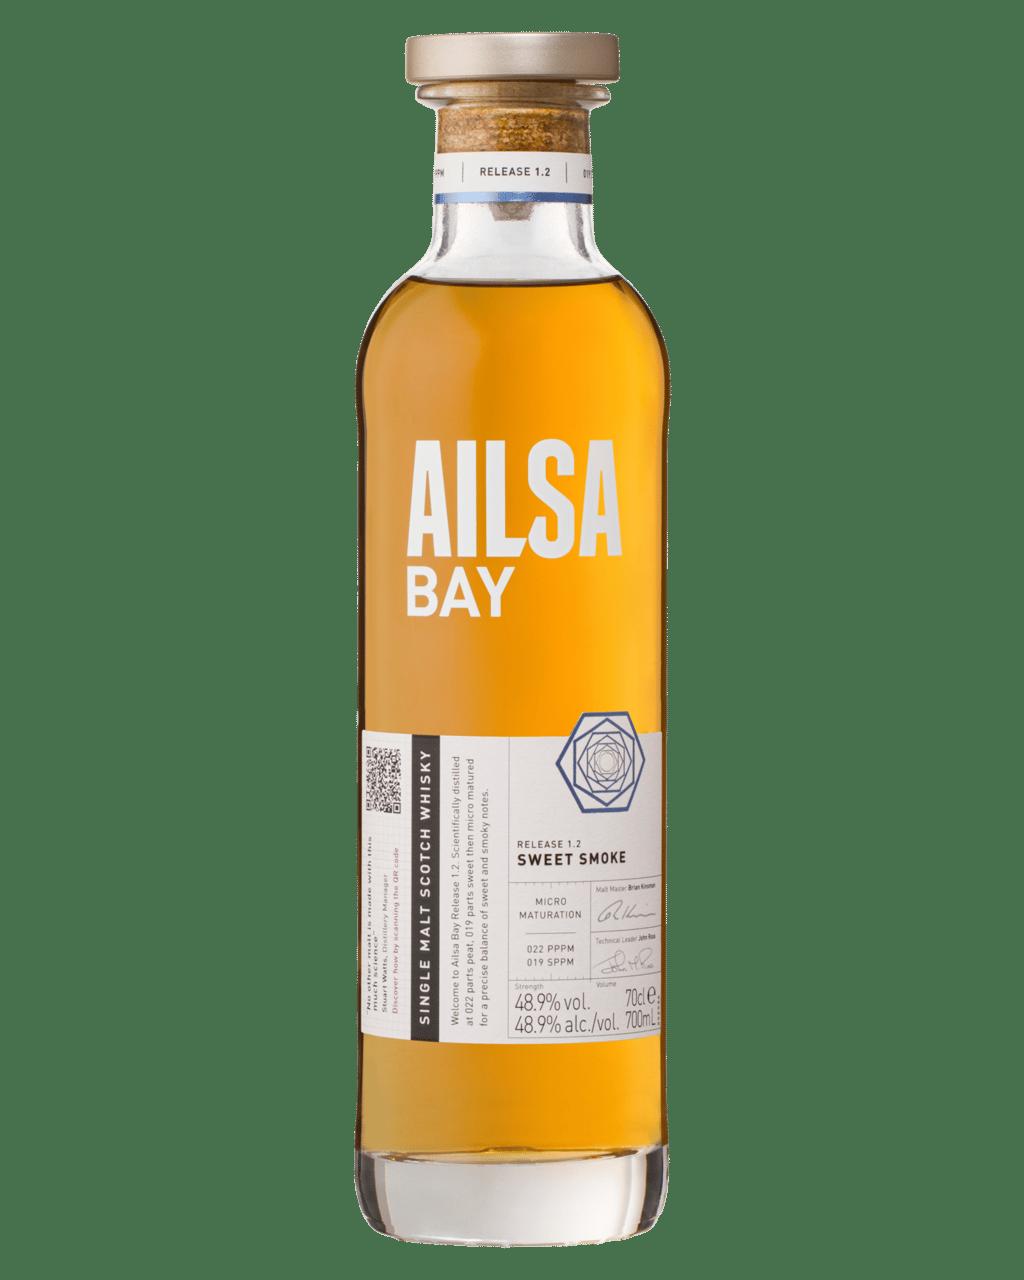 Buy Ailsa Bay Single Malt Whisky 700mL | Dan Murphy's